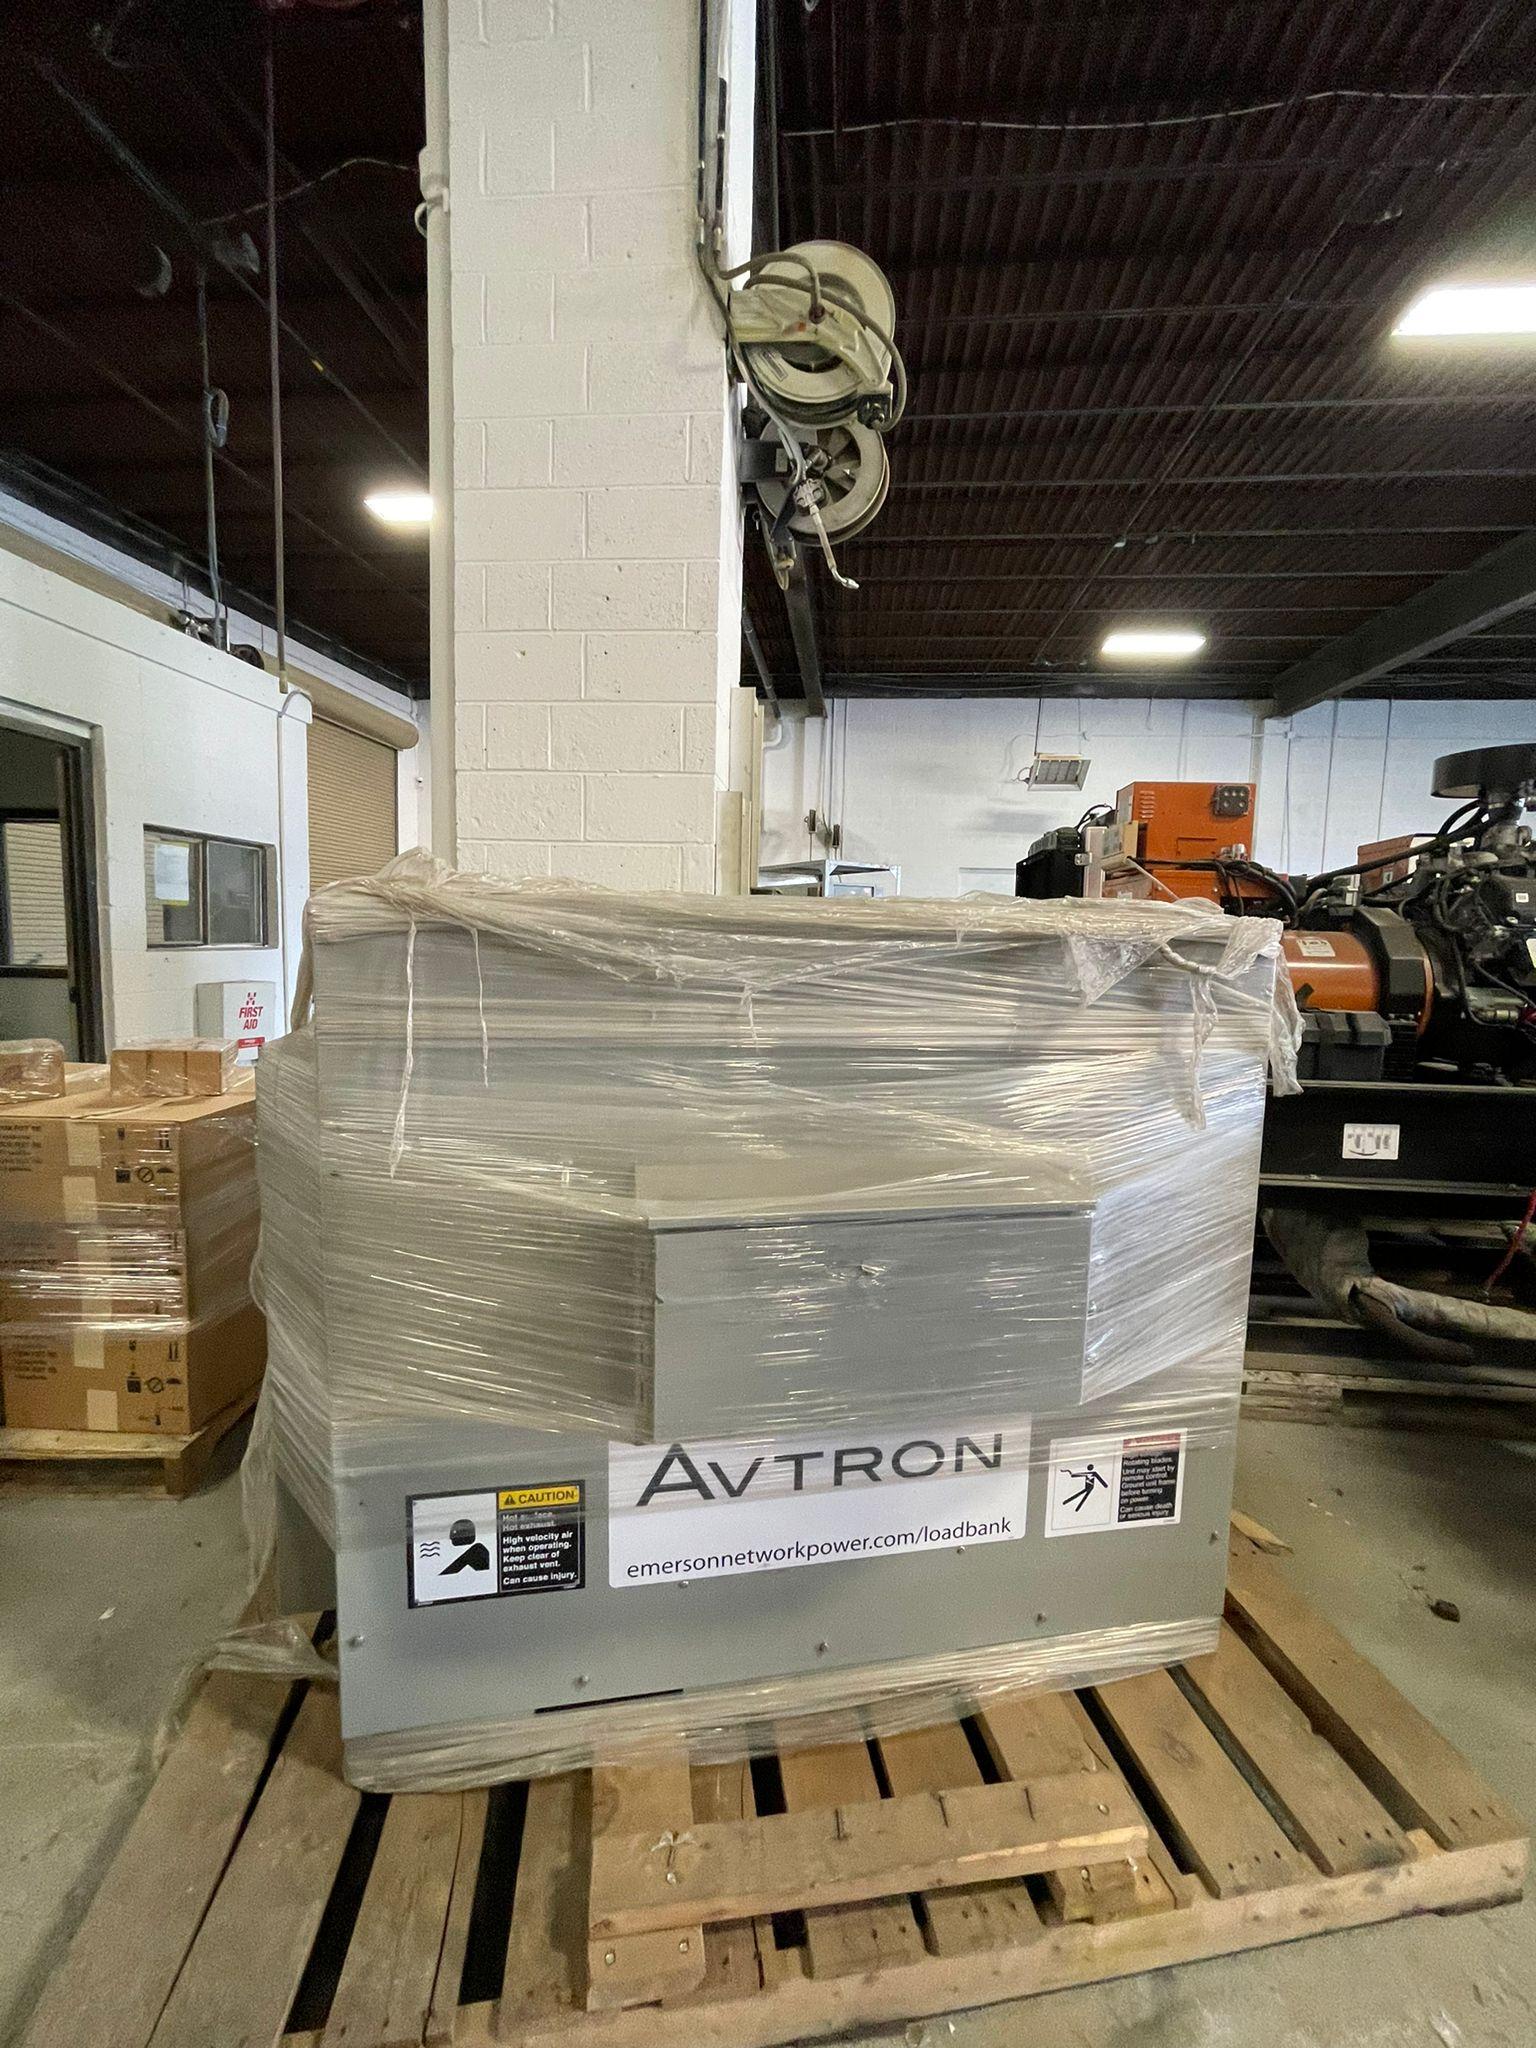 New 200 kW Avtron K675A Resistive Load Bank